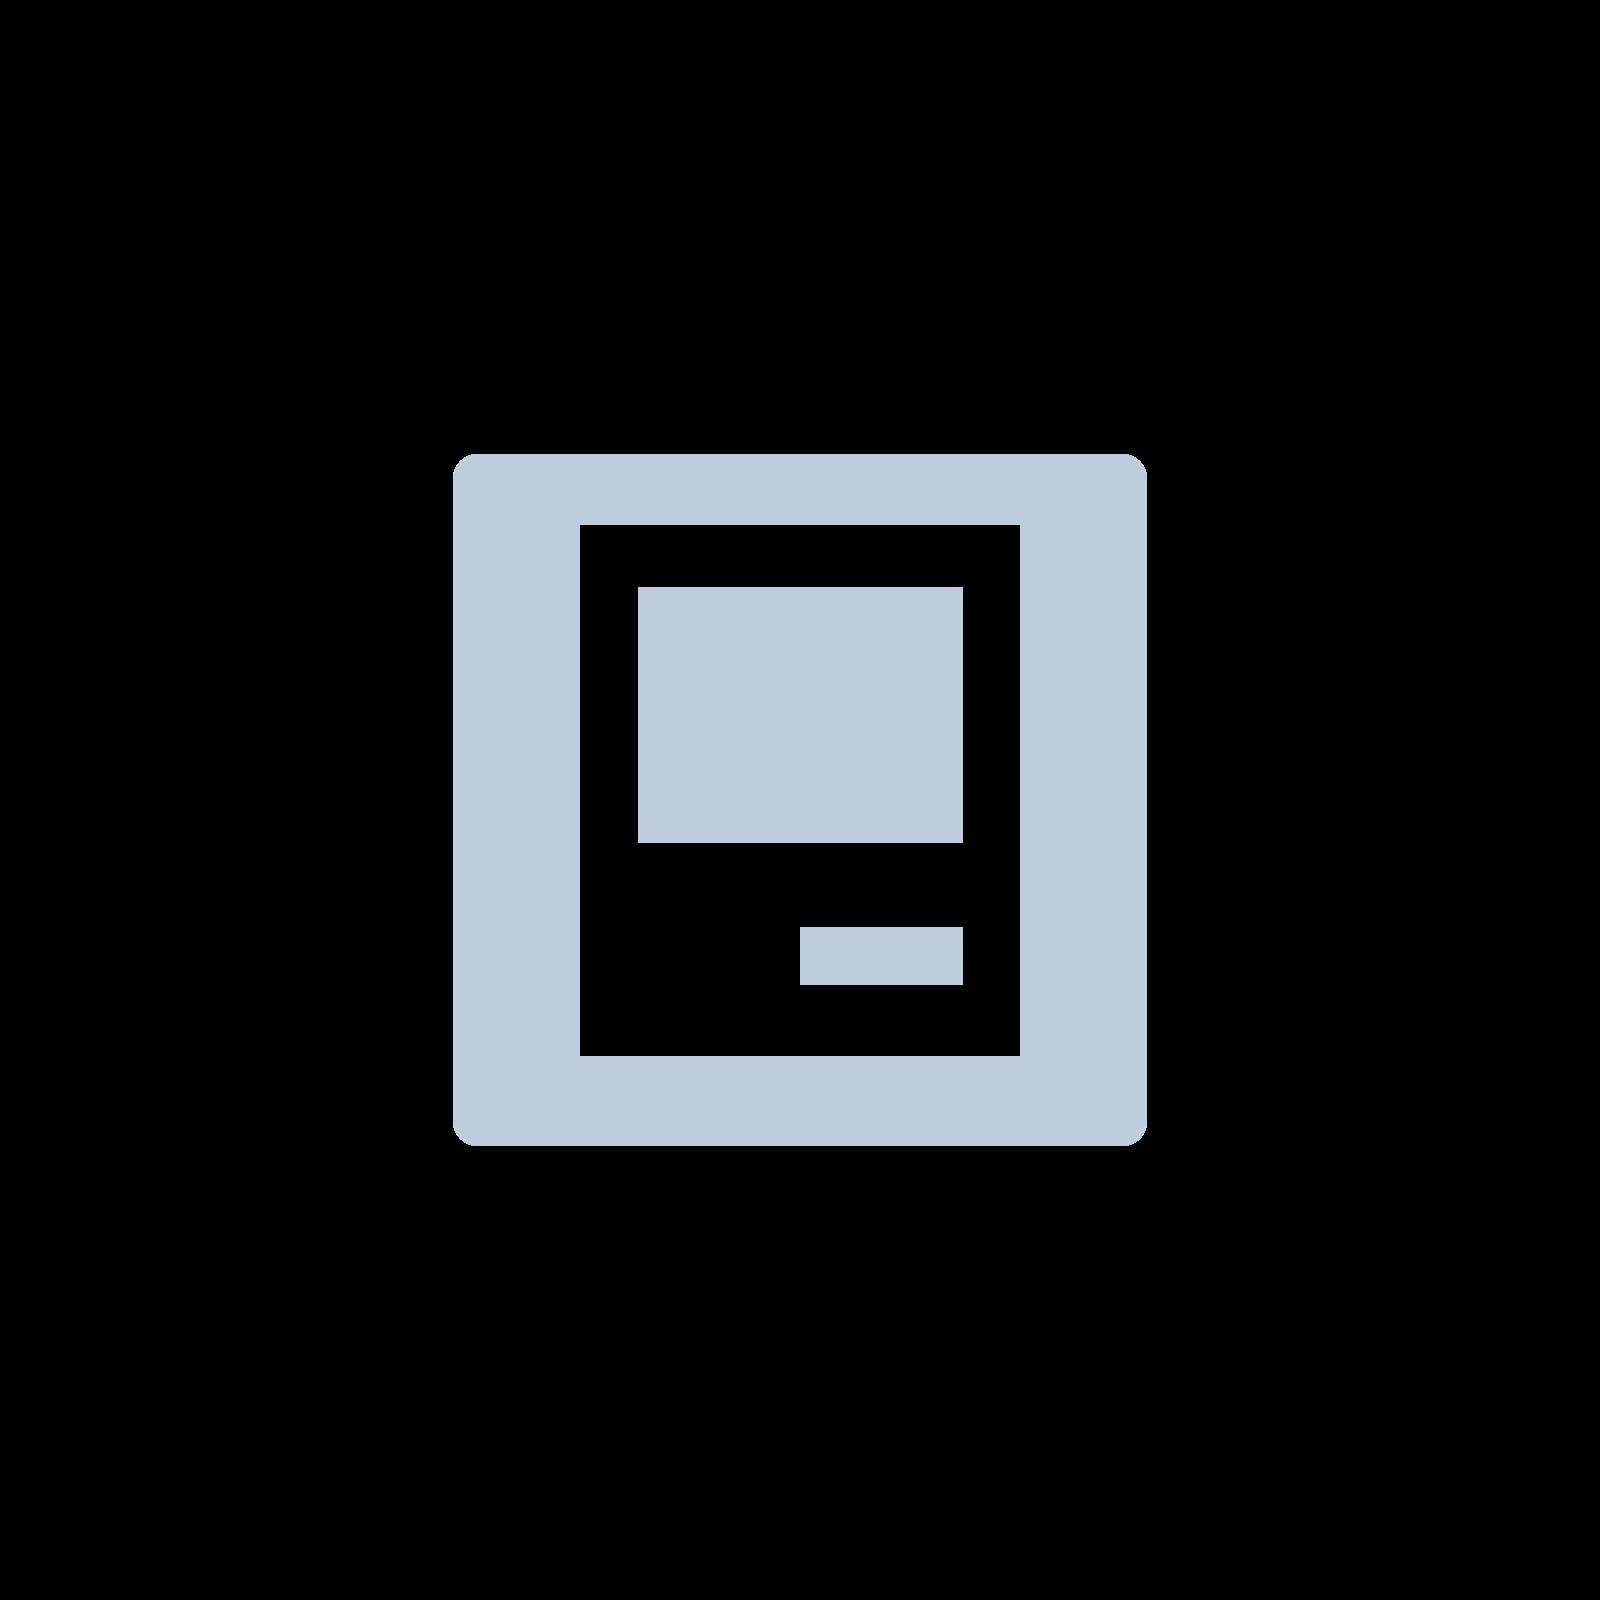 Apple iPhone SE 16GB Space Grau